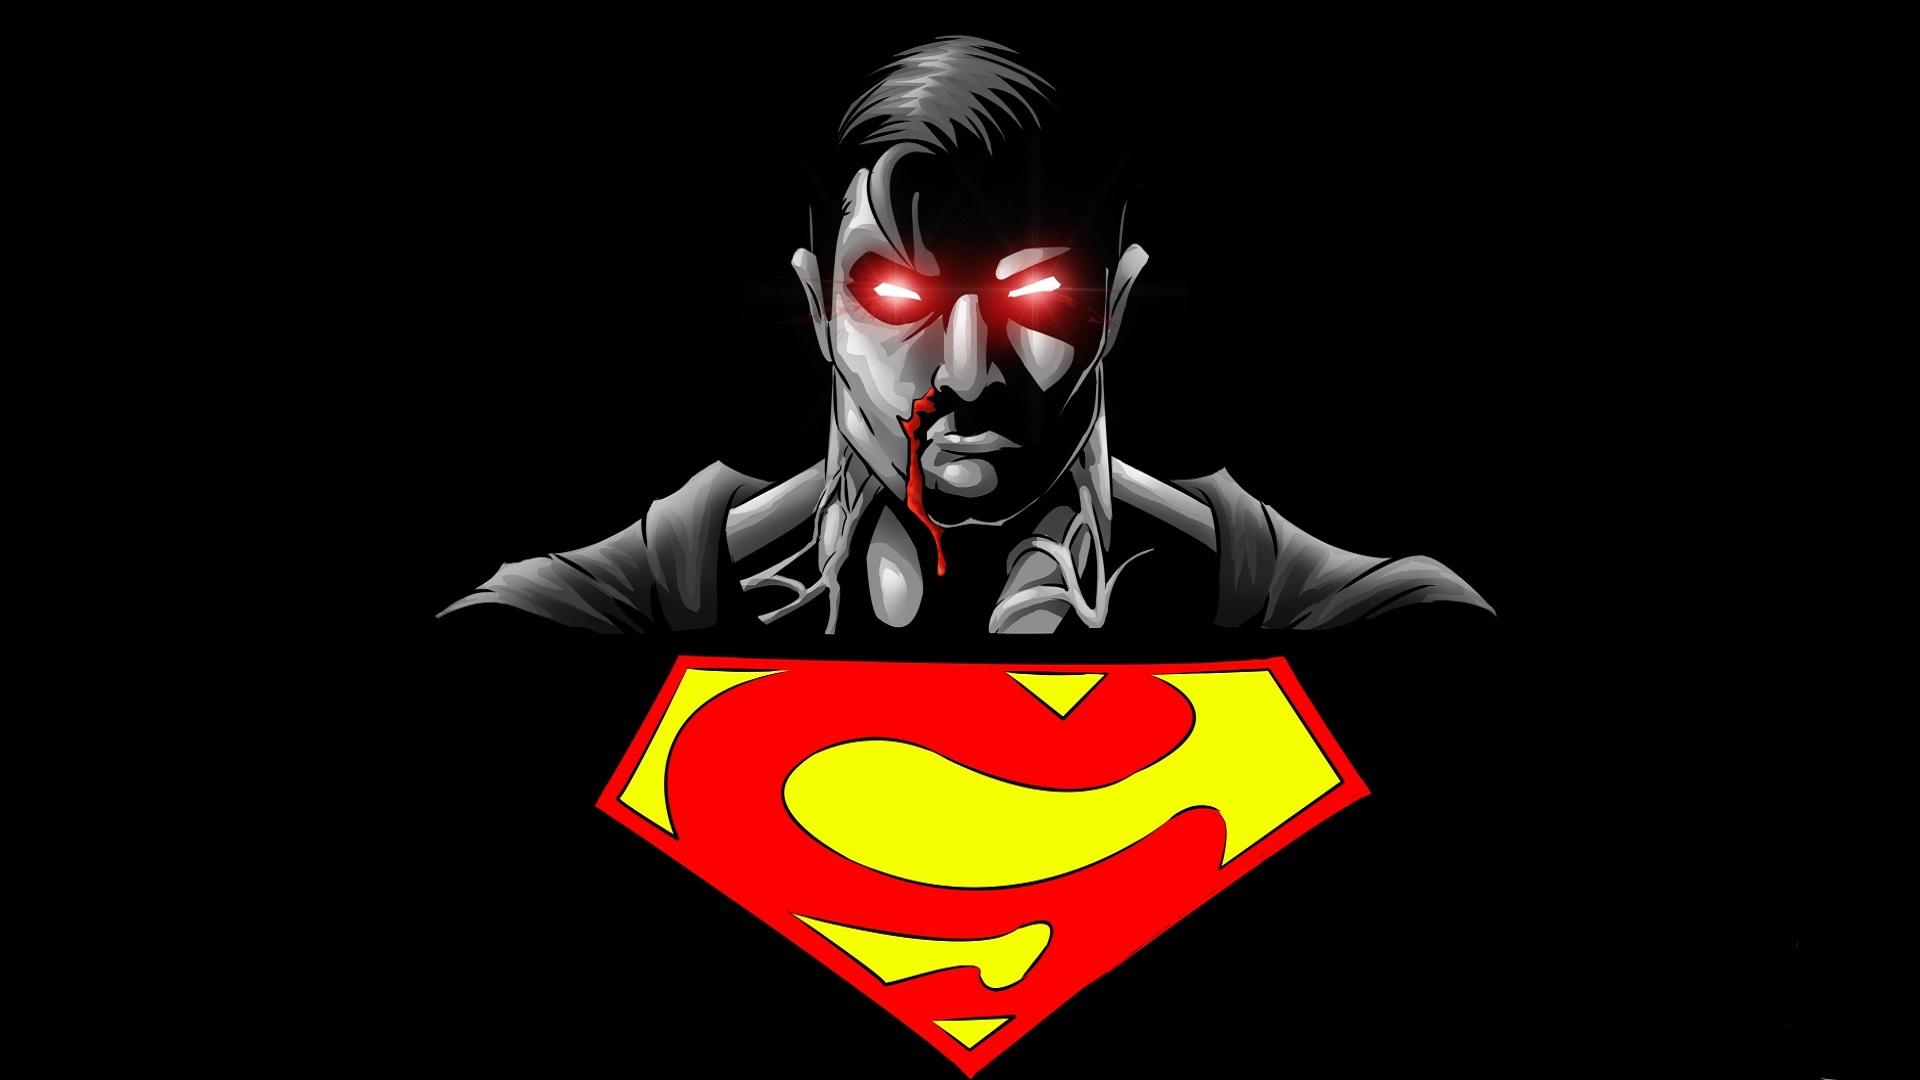 Superman HD Wallpaper For Desktop 12